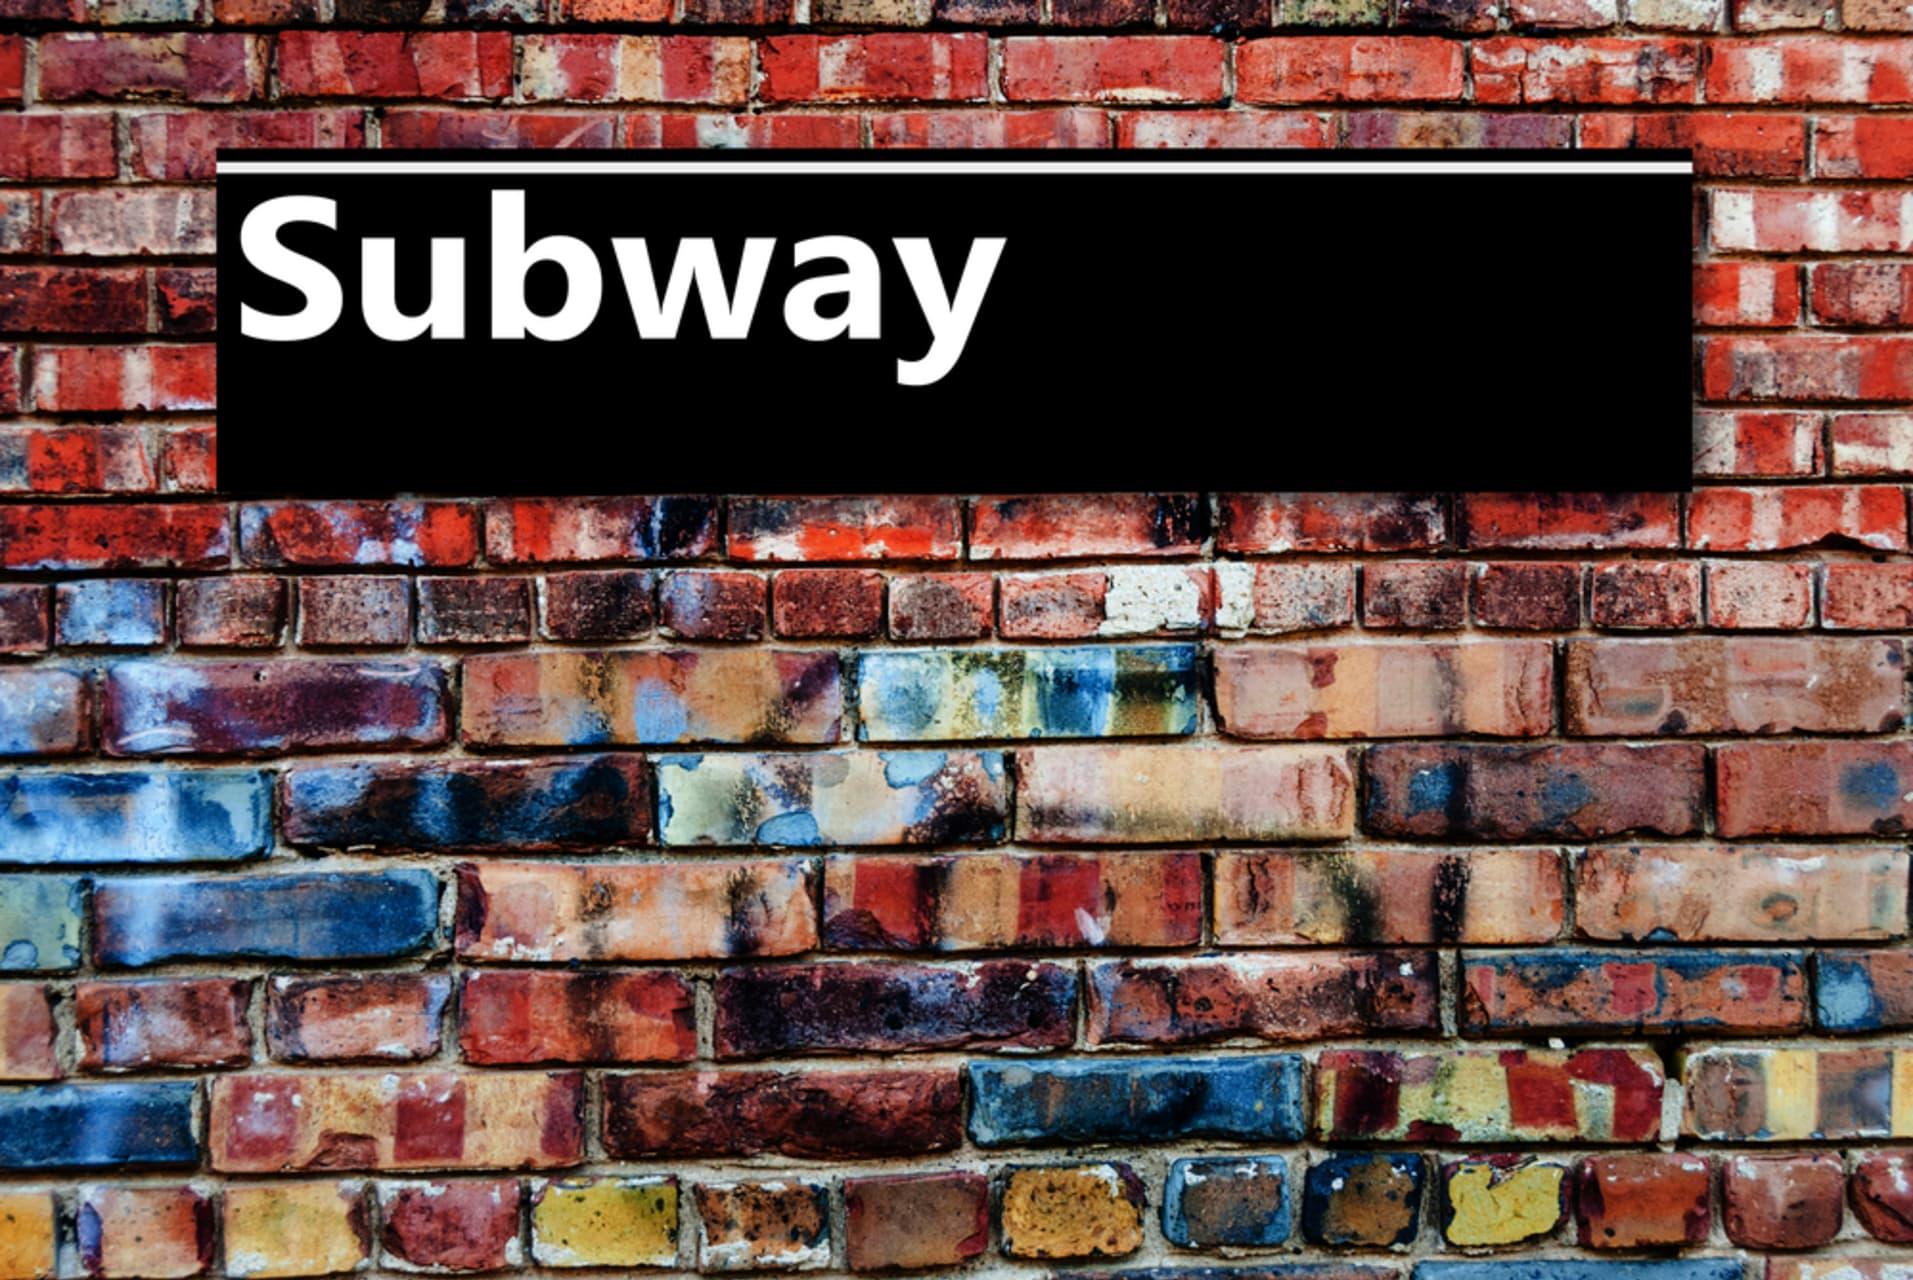 New York - New York City Subway Art - Part One - 23rd Street